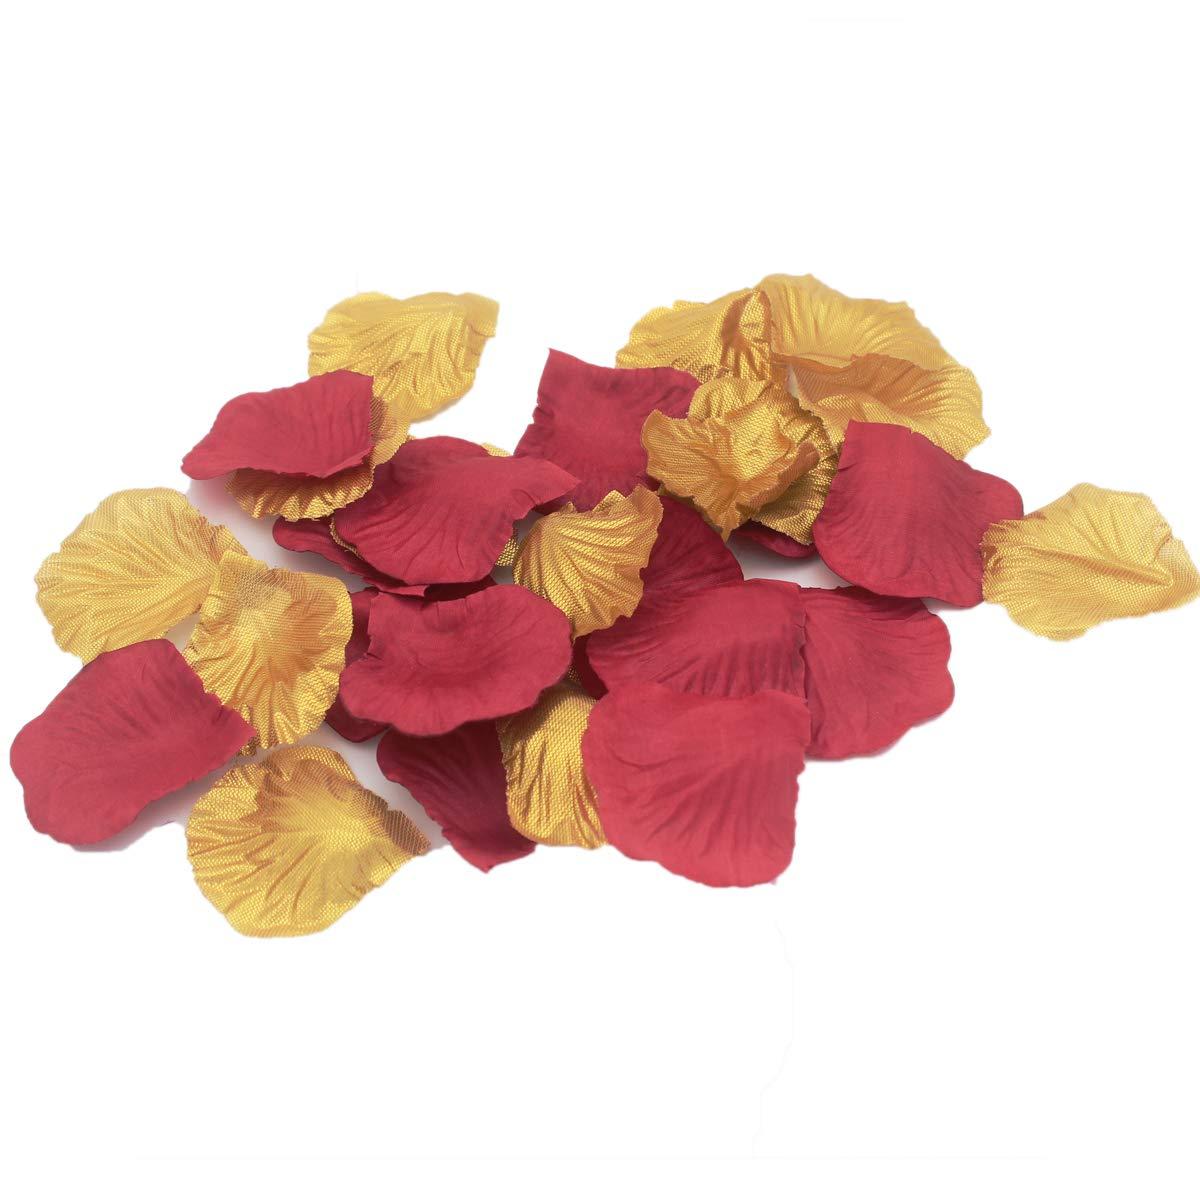 ALLHEARTDESIRES-1000PCS-Maroon-Burgundy-Gold-Artificial-Flower-Petals-Wedding-Confetti-Table-Scatters-Centerpieces-Bridal-Shower-Flower-Girl-Basket-Aisle-Decoration